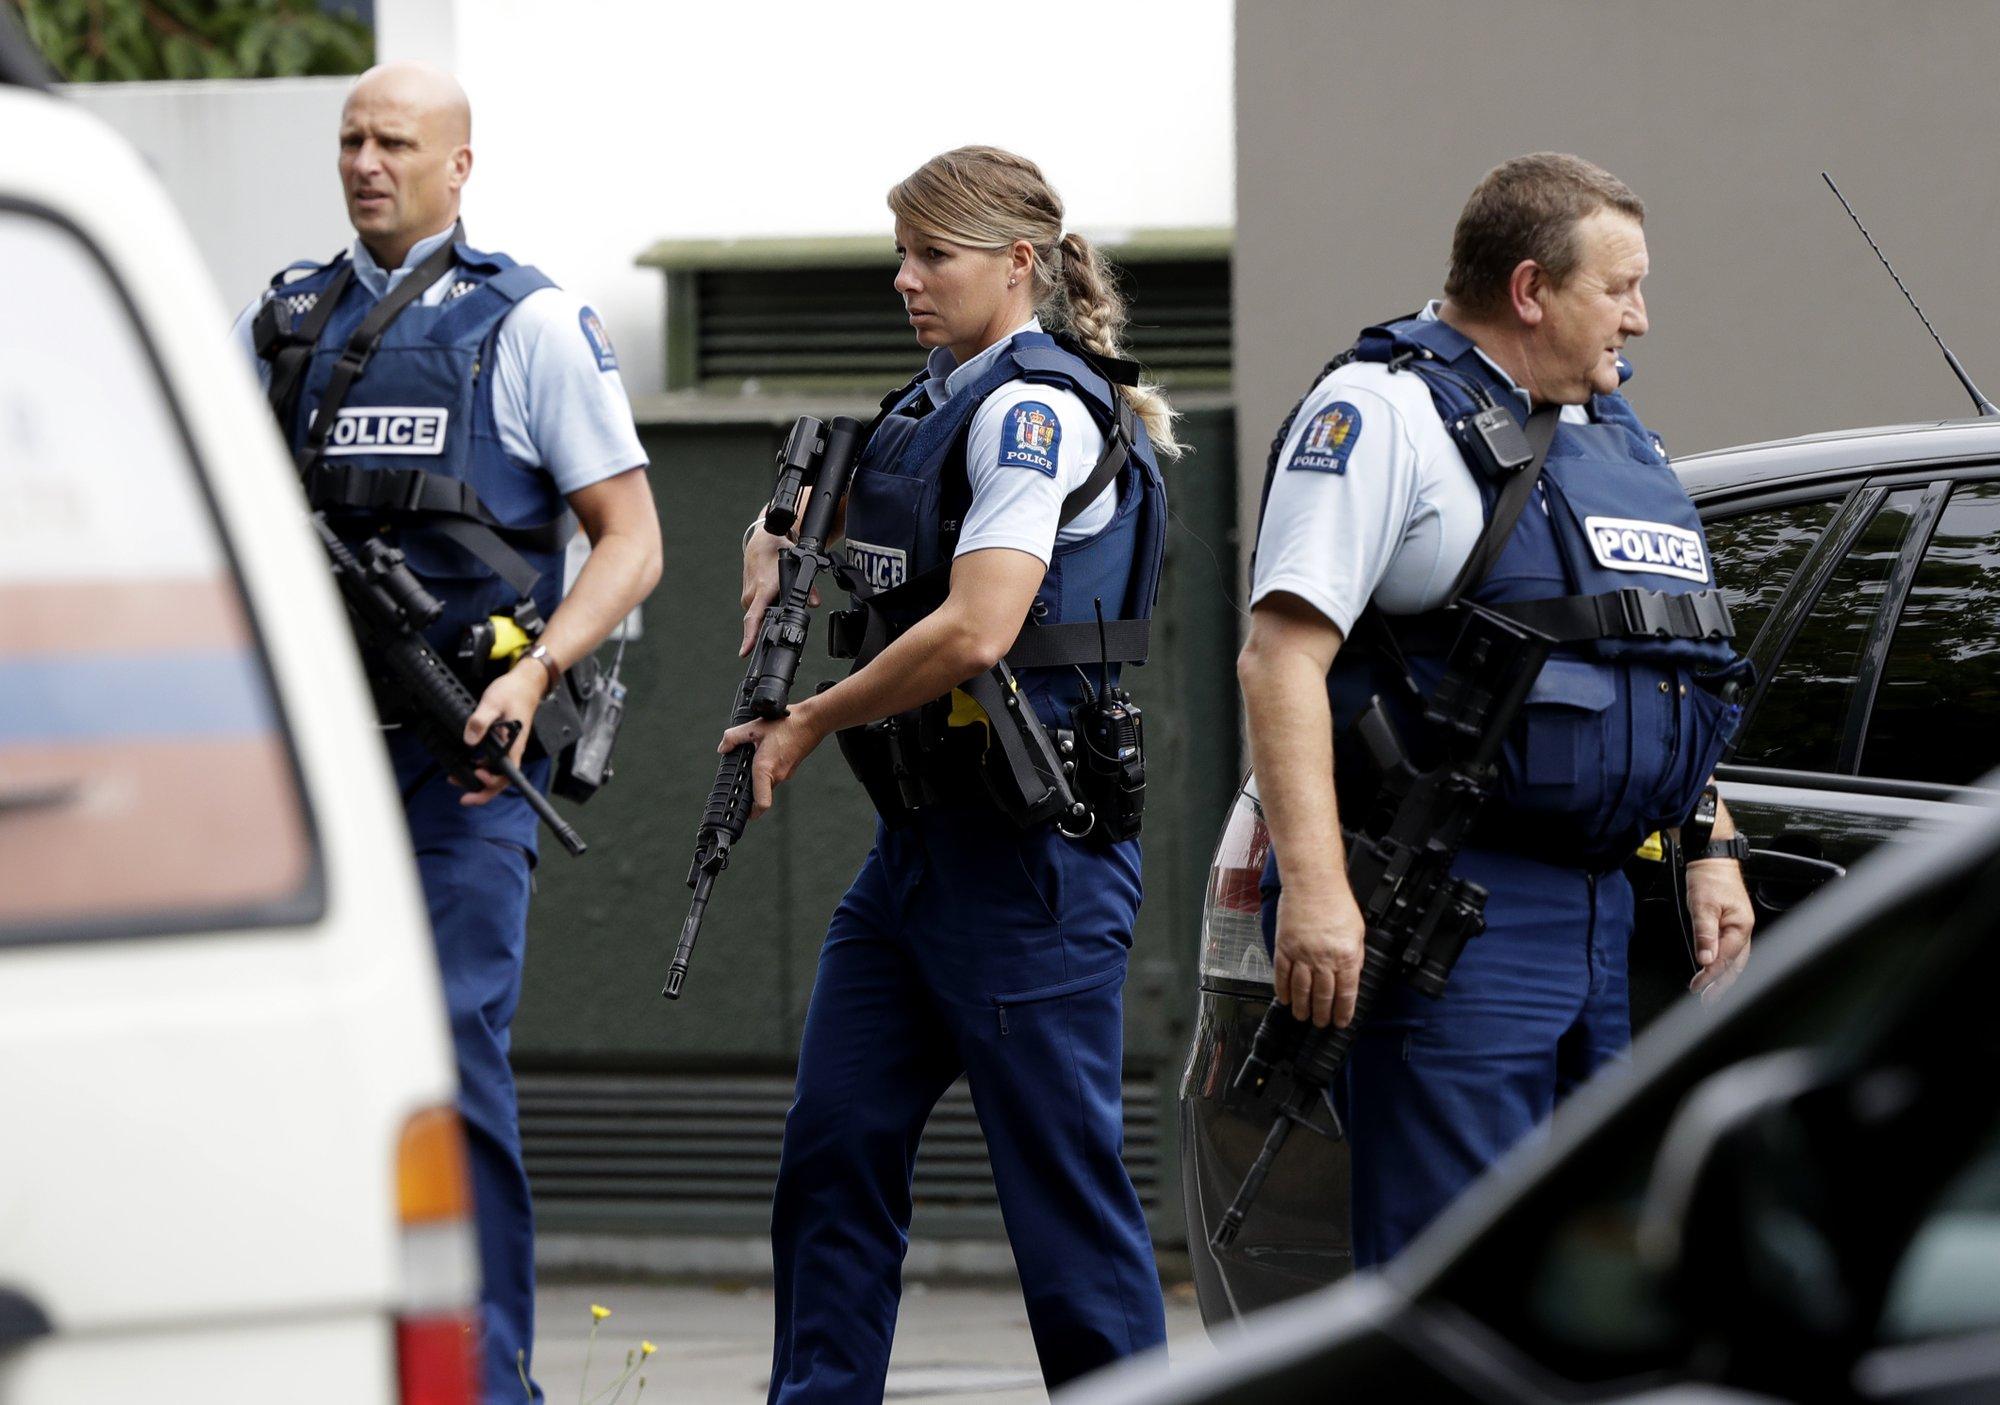 armed police partol in new zealand_1552620191151.jpeg.jpg